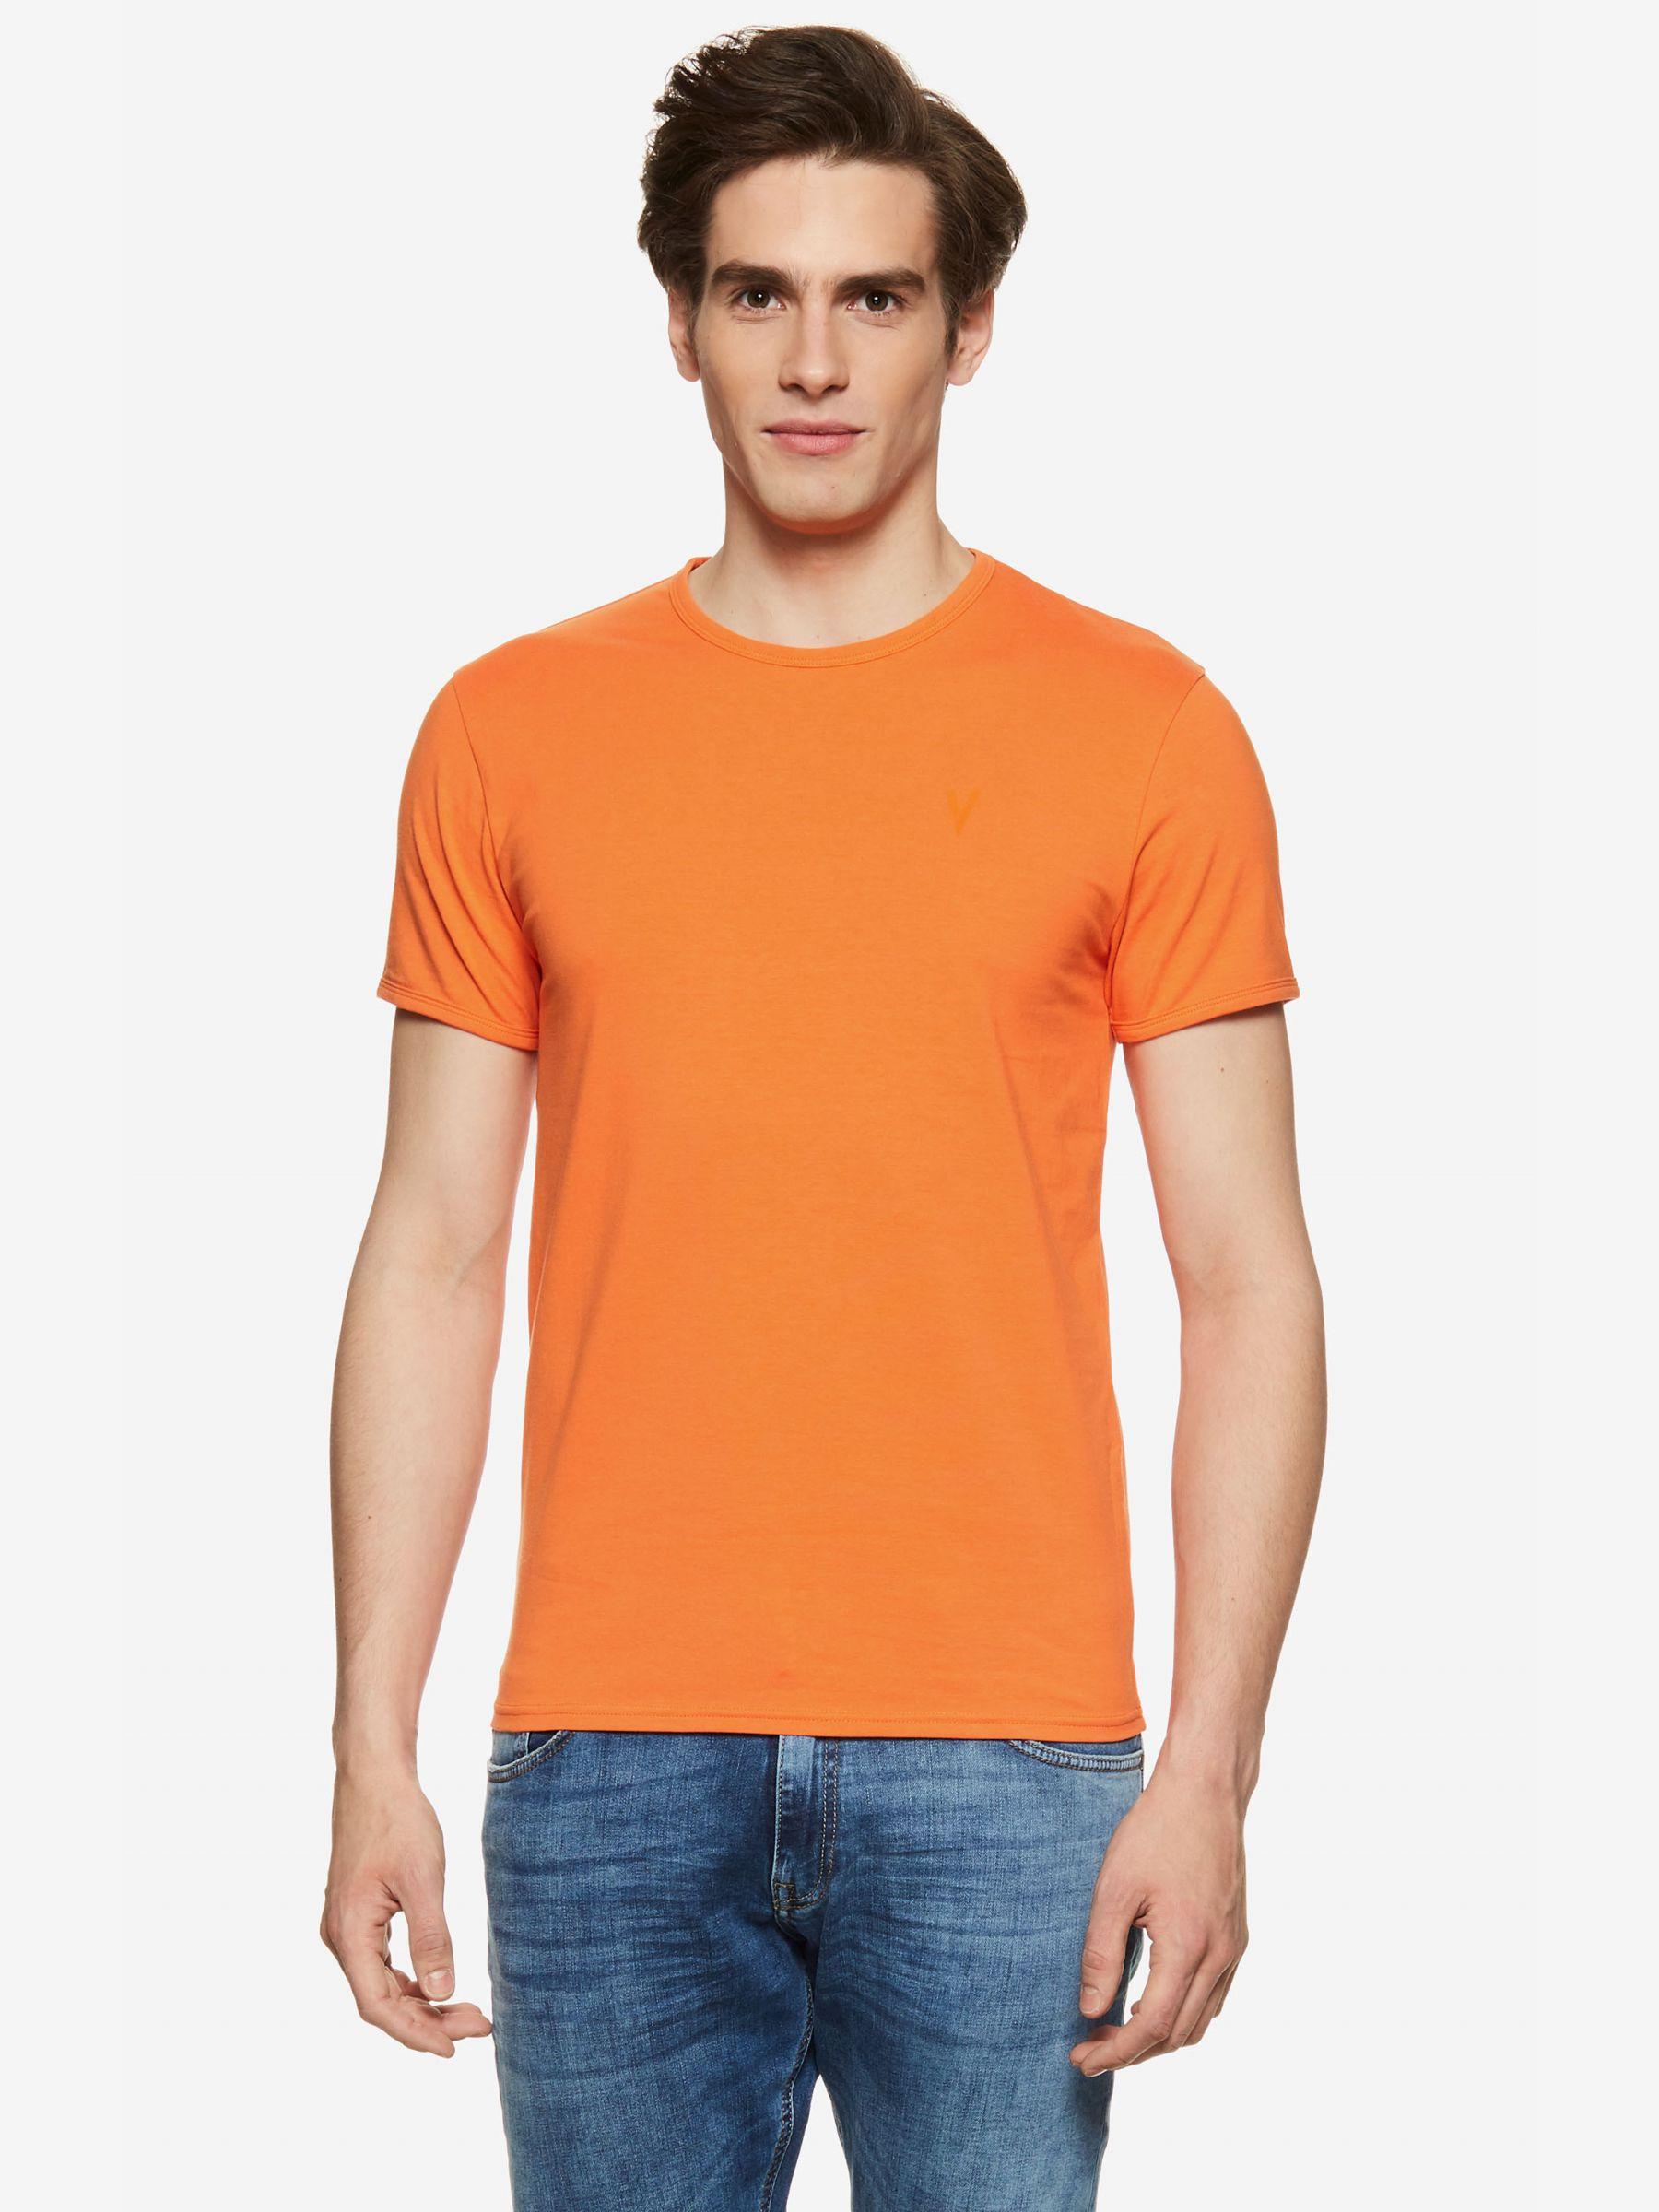 Vistula T-shirt i Polo